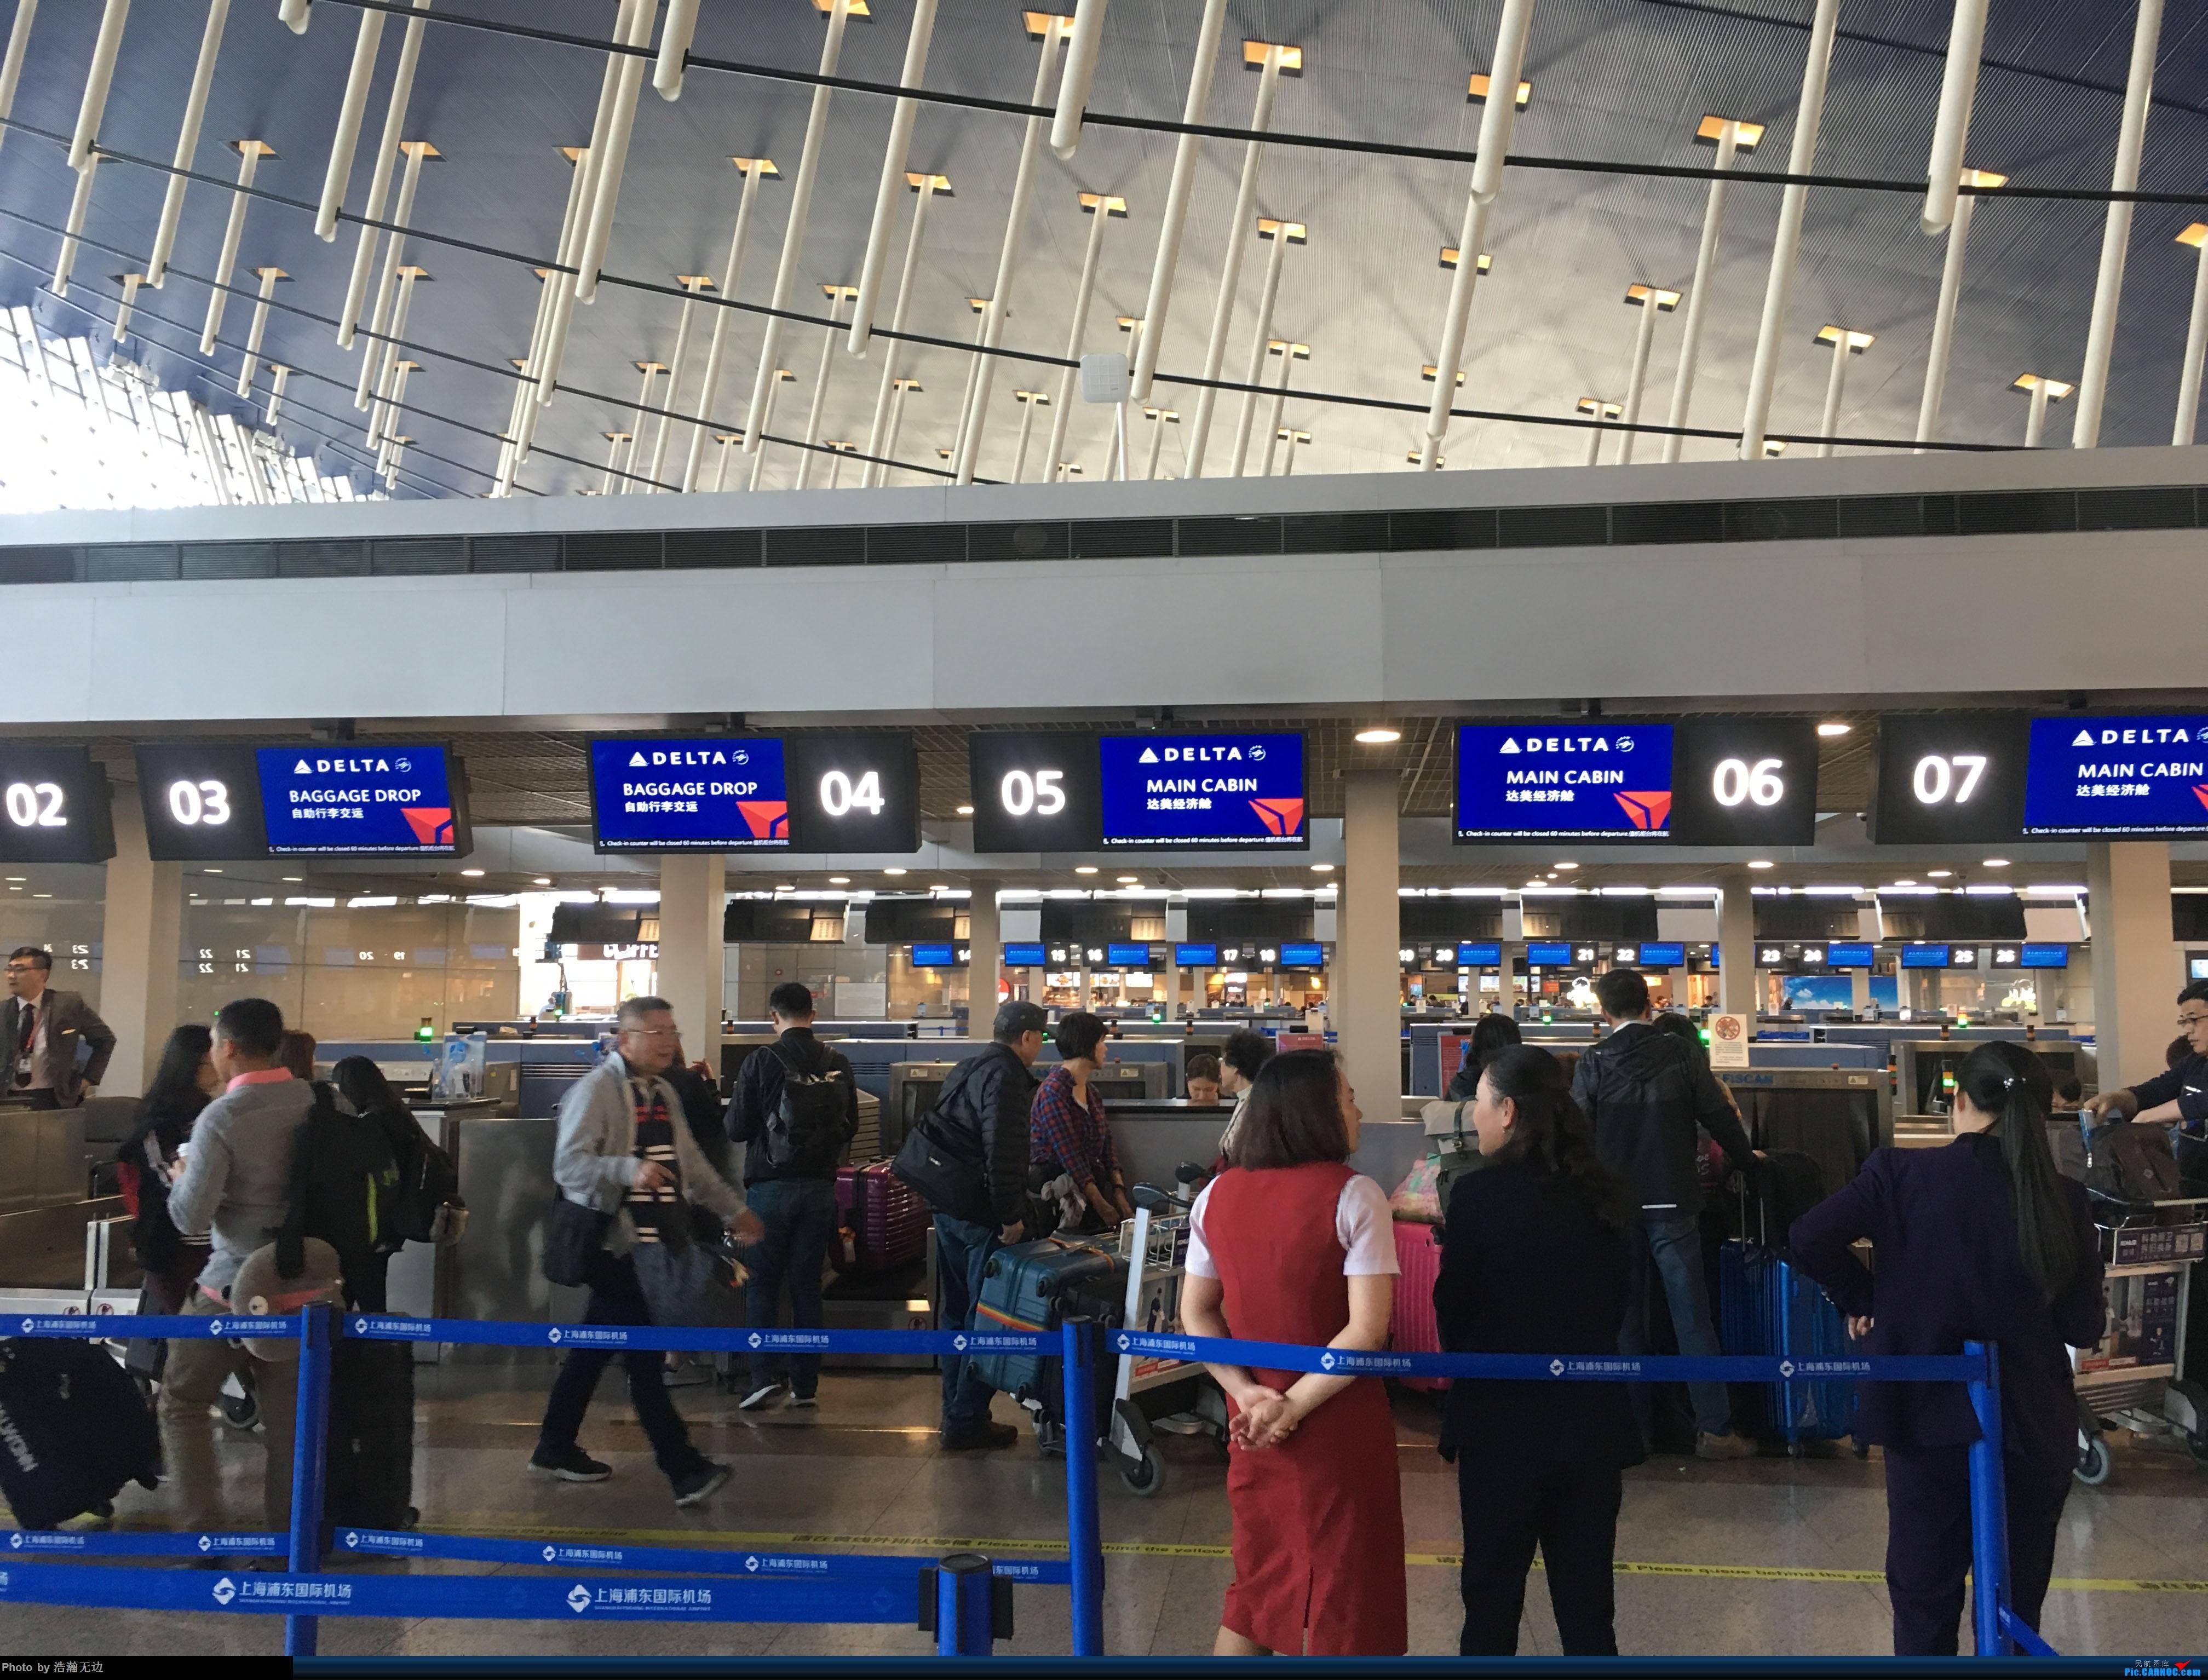 Re:[原创]【美西14日蜜月之旅】前篇:达美航空DL88 A350-900 上海—洛杉矶